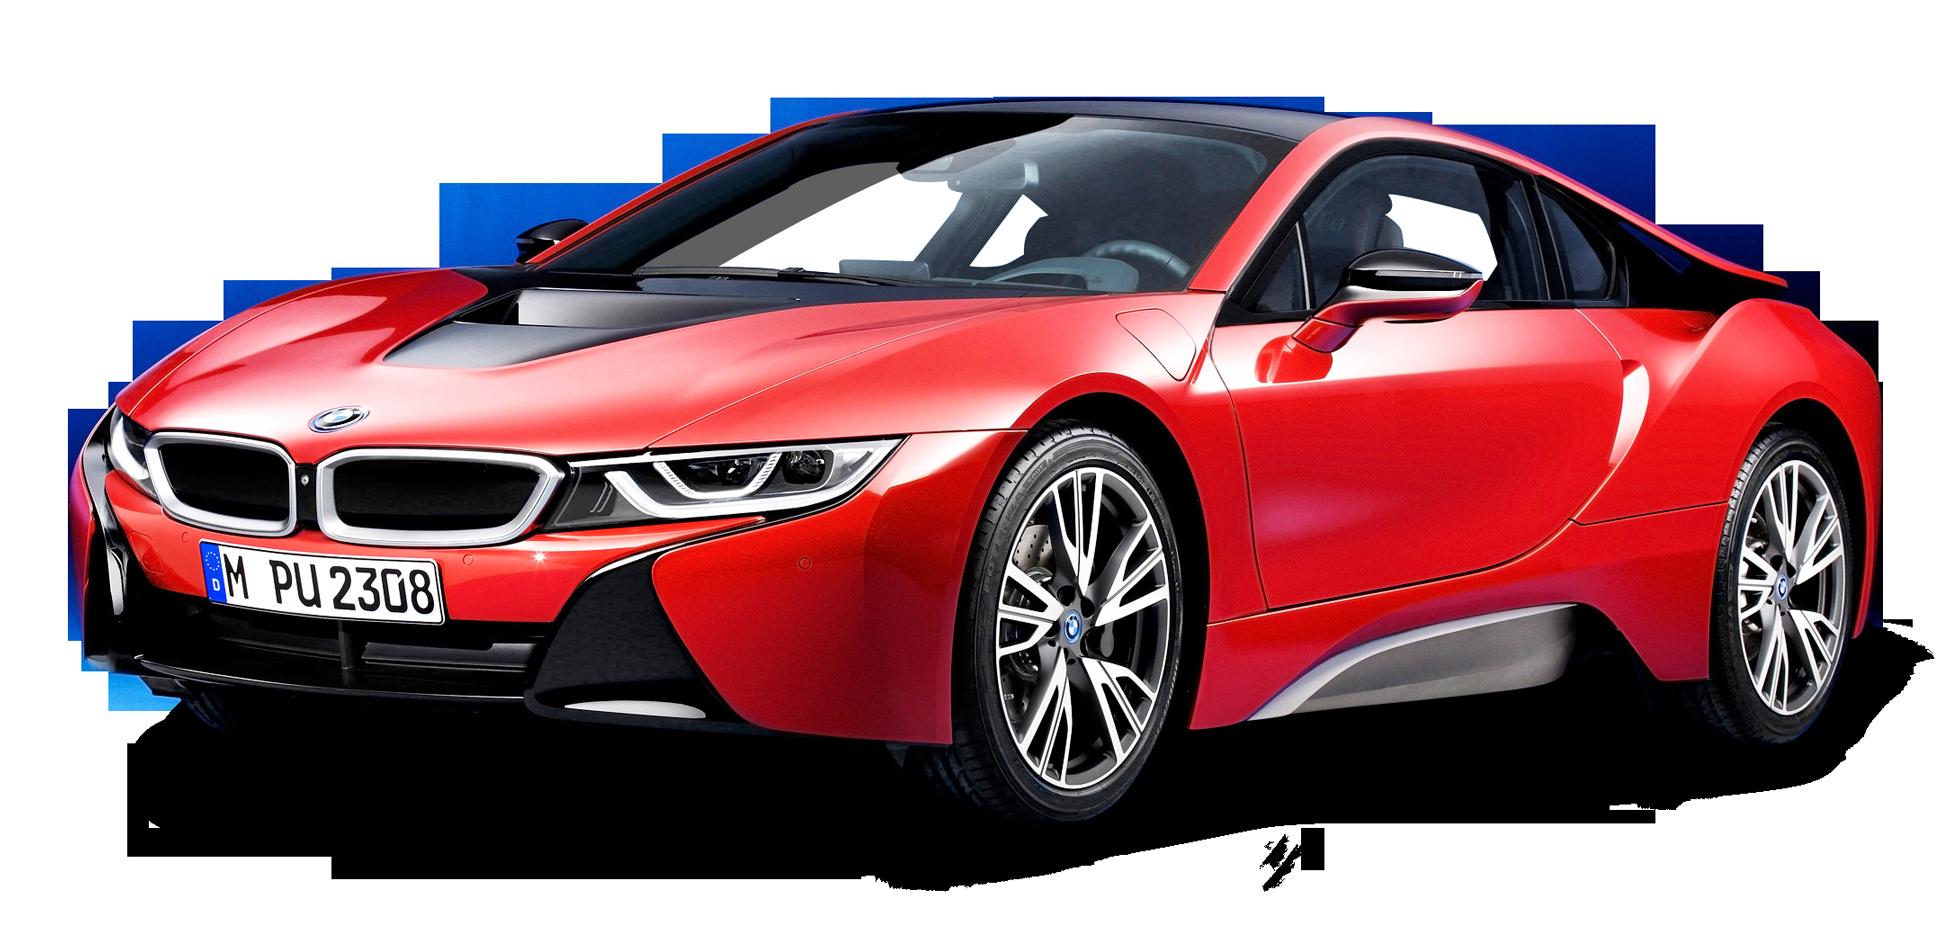 Bmw I8 Protonic Red Car Png Image Purepng Free Transparent Cc0